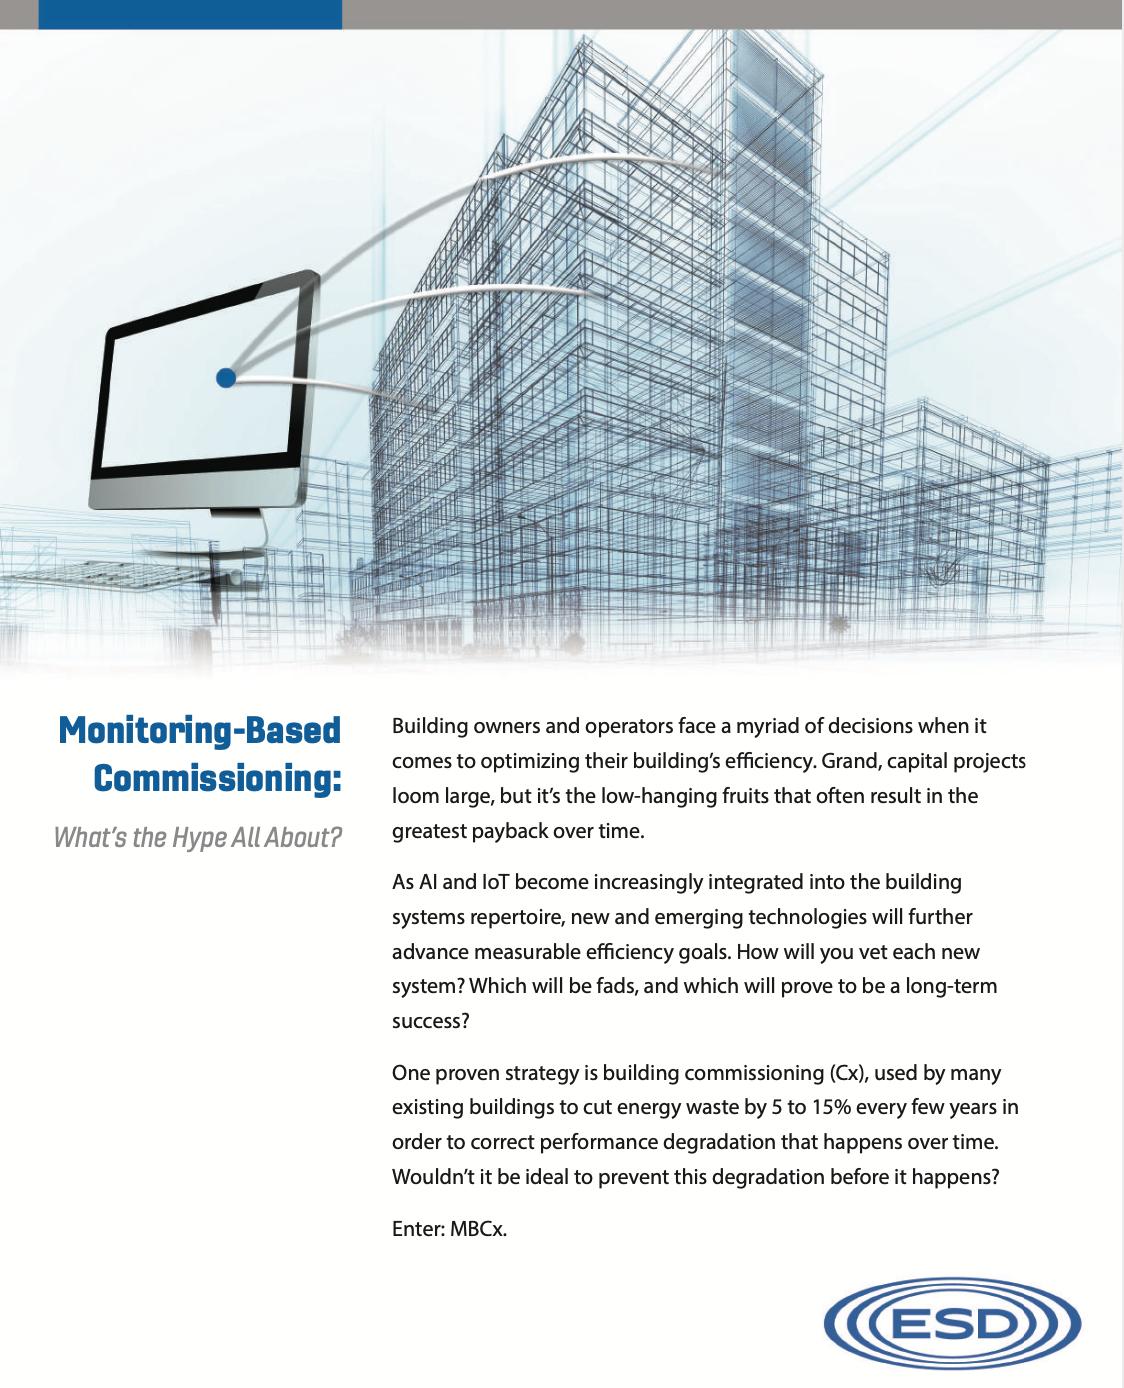 Monitoring-Based Commissioning